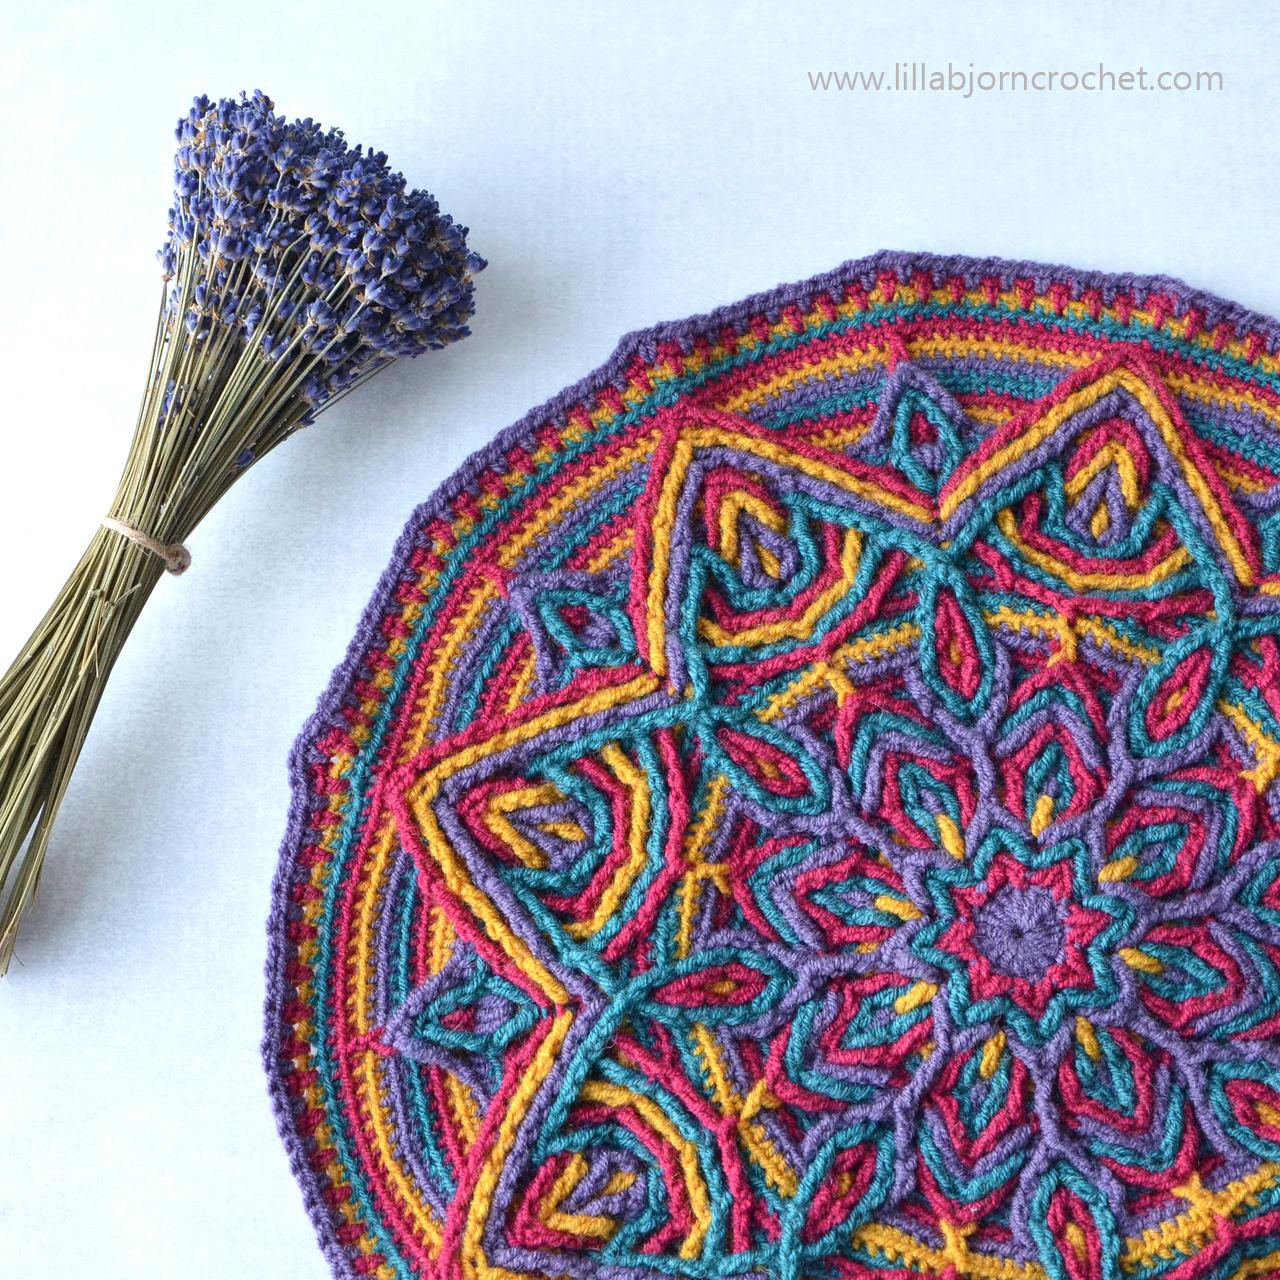 Illusion mandala new overlay crochet pattern lillabj rn for Pattern overlay